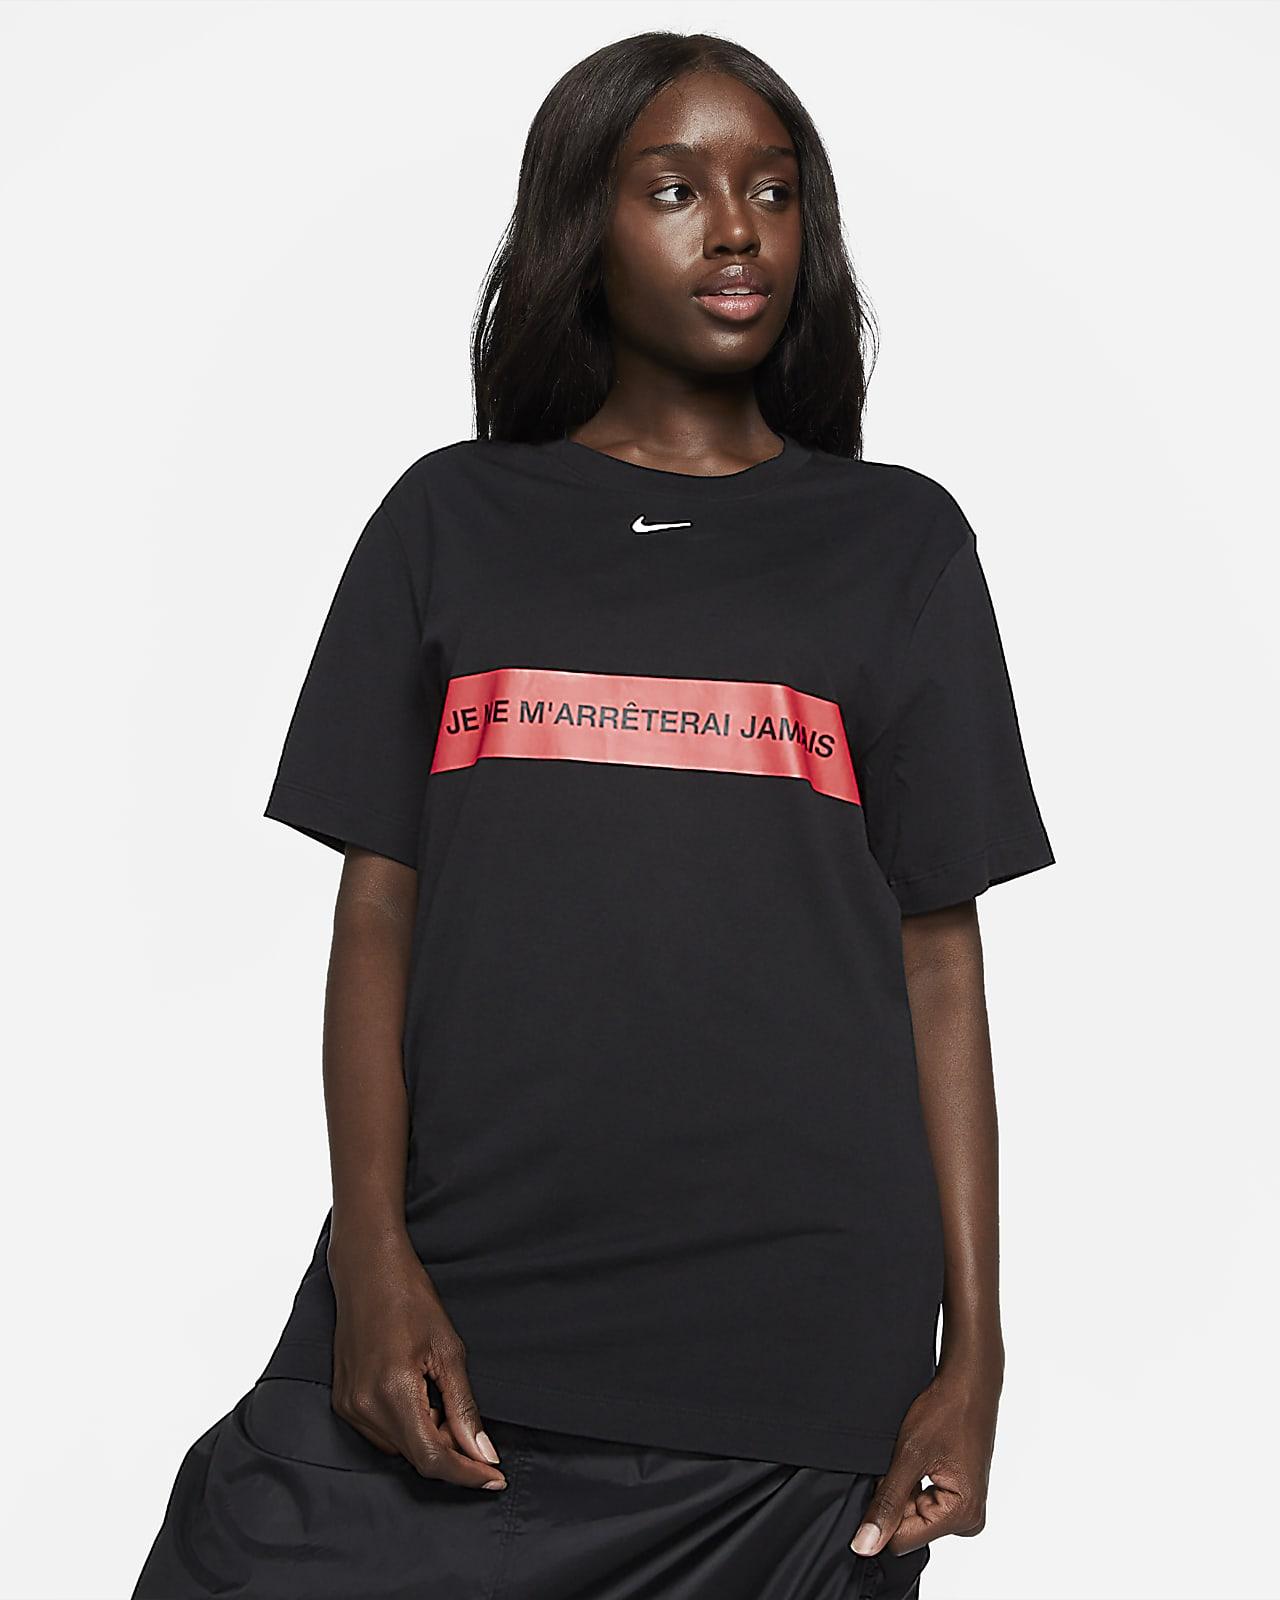 Tennis-t-shirt Serena Williams